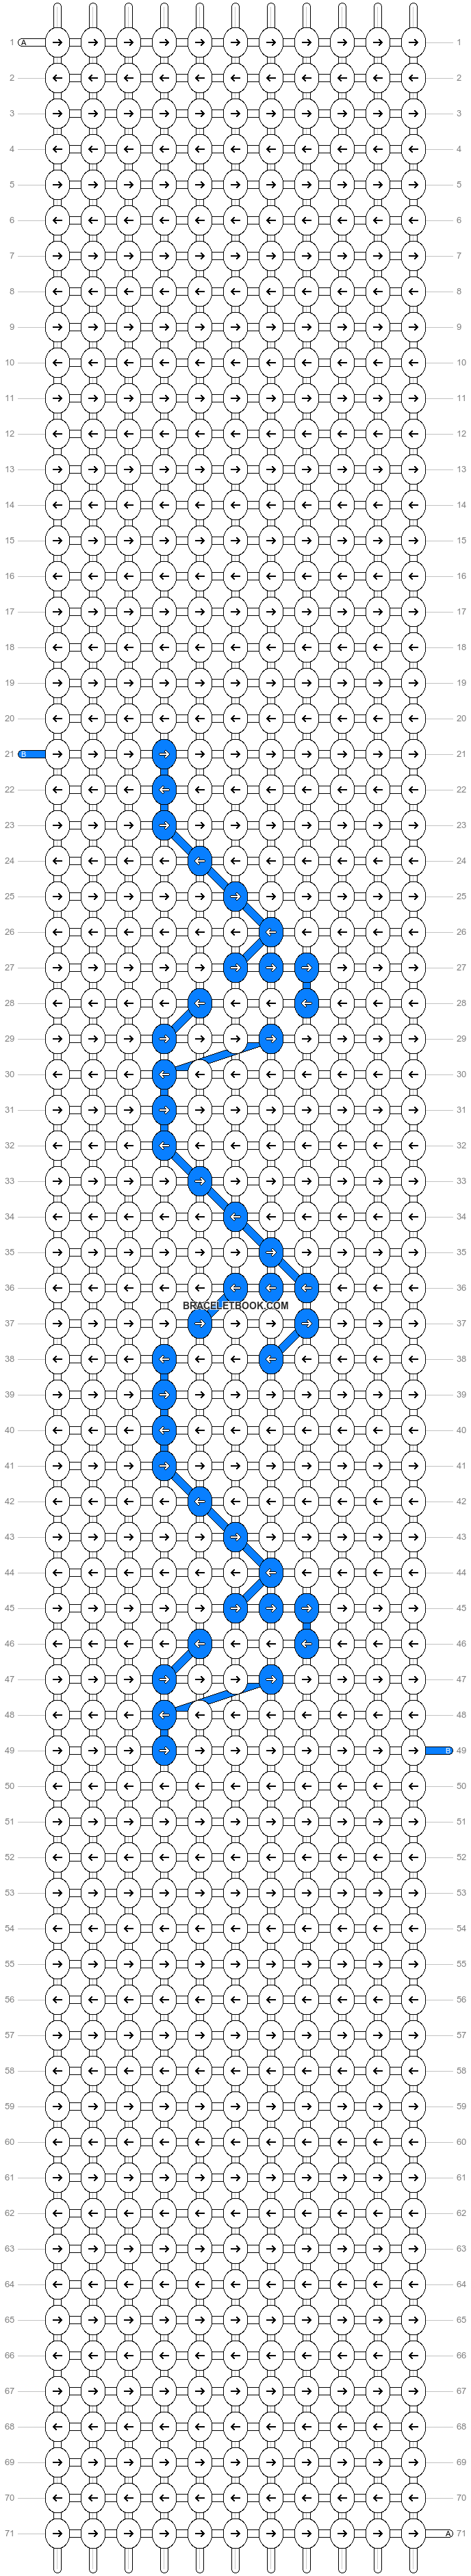 Alpha pattern #38672 pattern